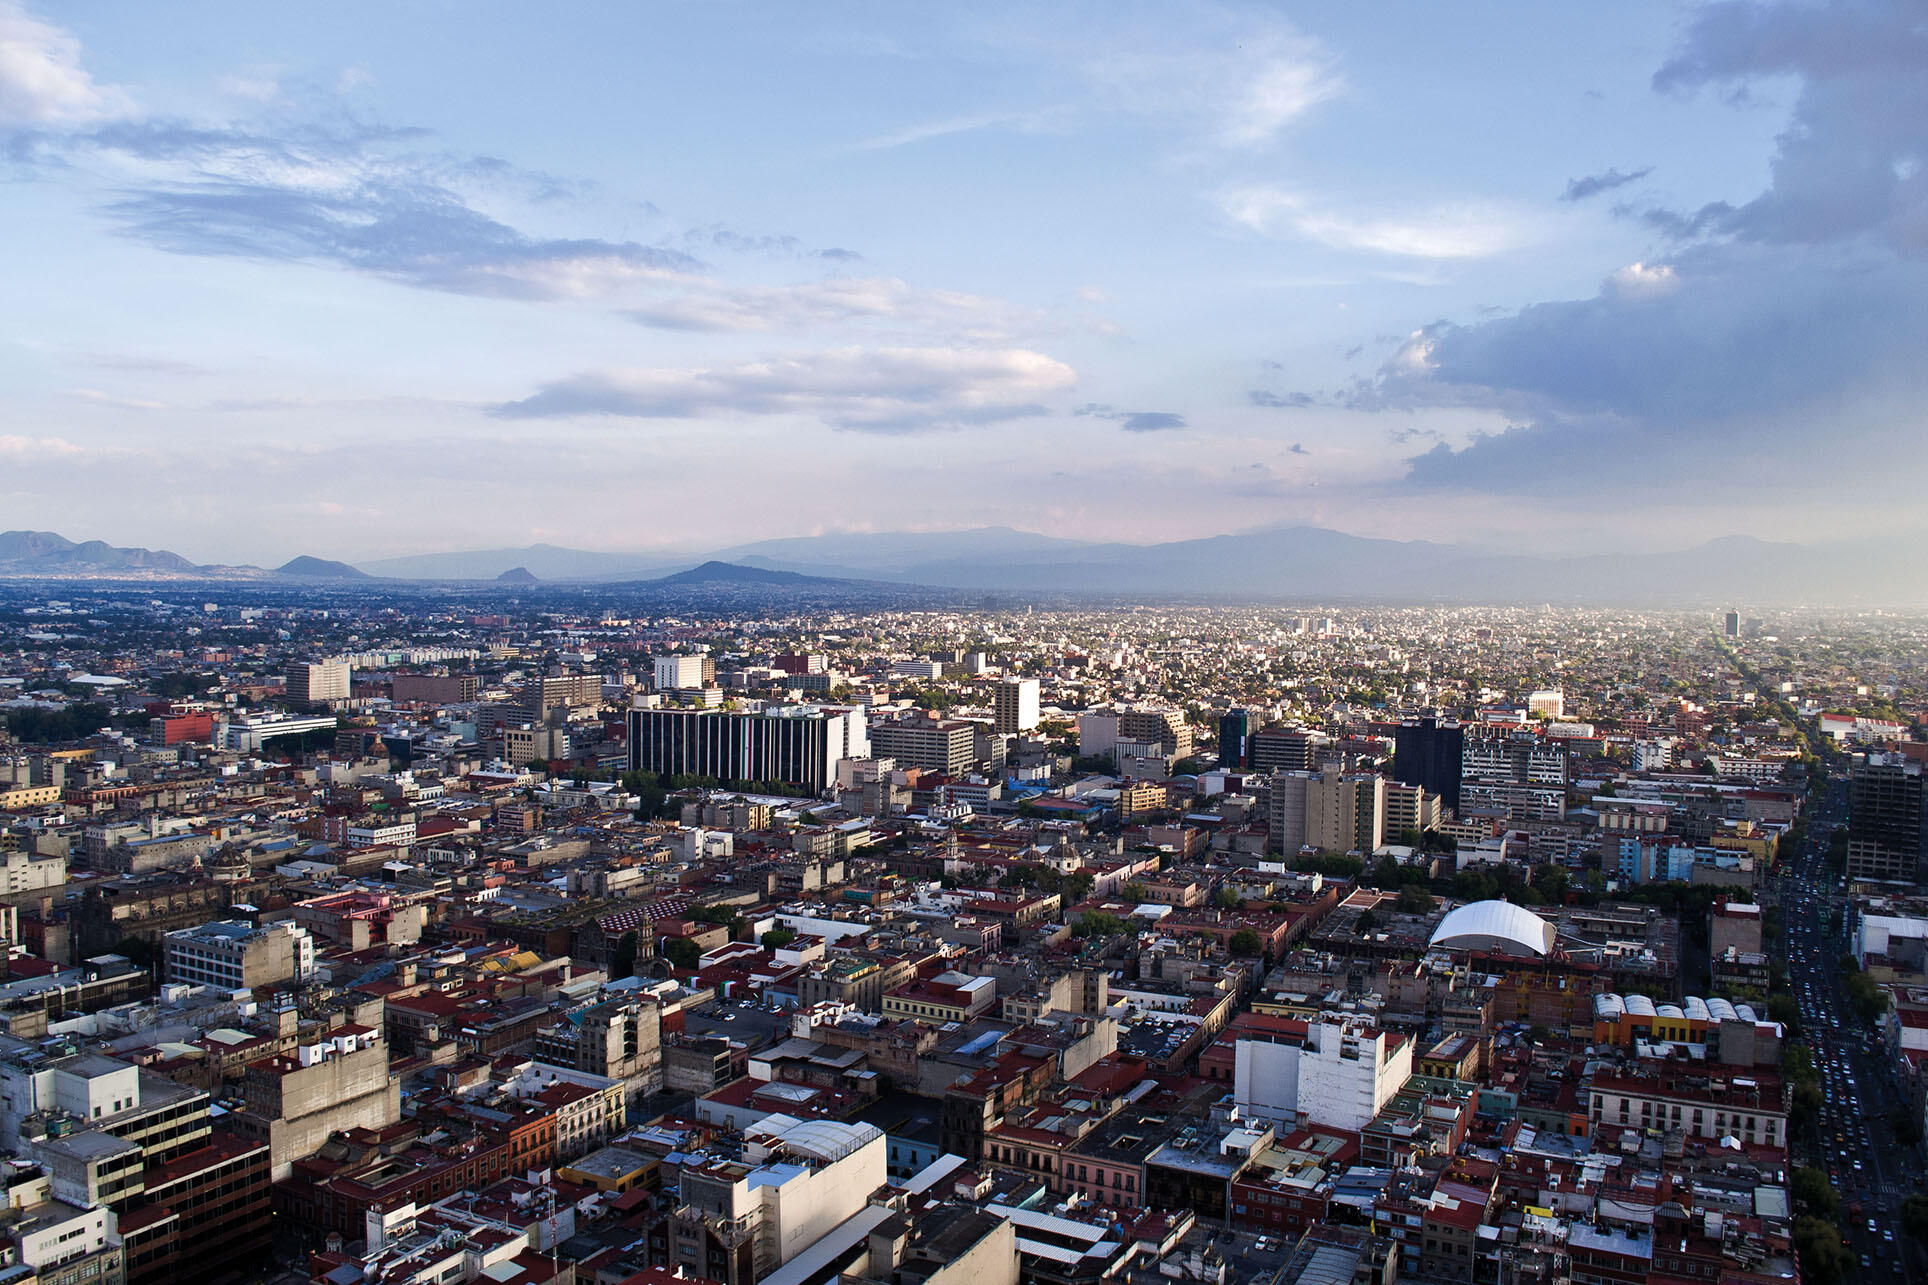 An aerial photo highlights the urban sprawl of Mexico City.  (Photo by Kasper Christensen.)